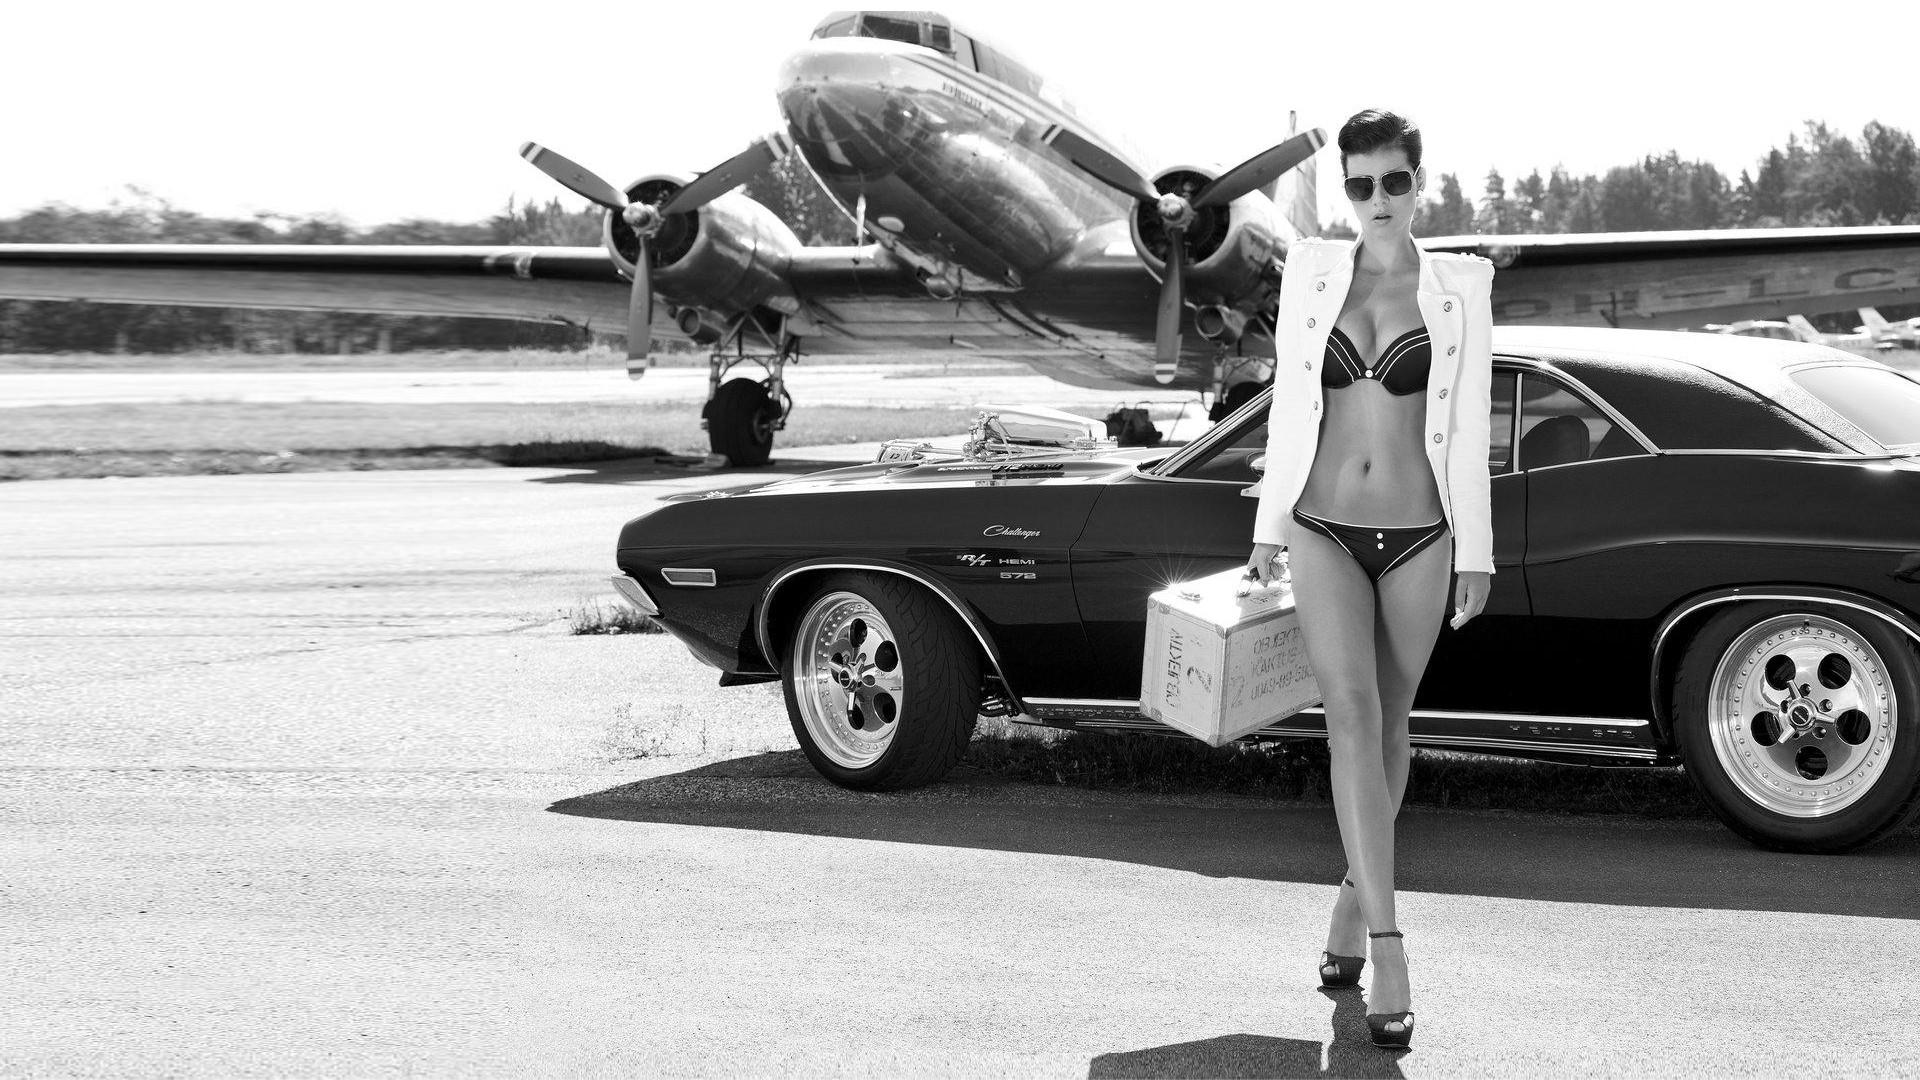 Wallpaper Women With Cars Propeller Lingerie Vintage Car Planes Douglas DC 3 Dodge Challenger R T Wheel Black And White